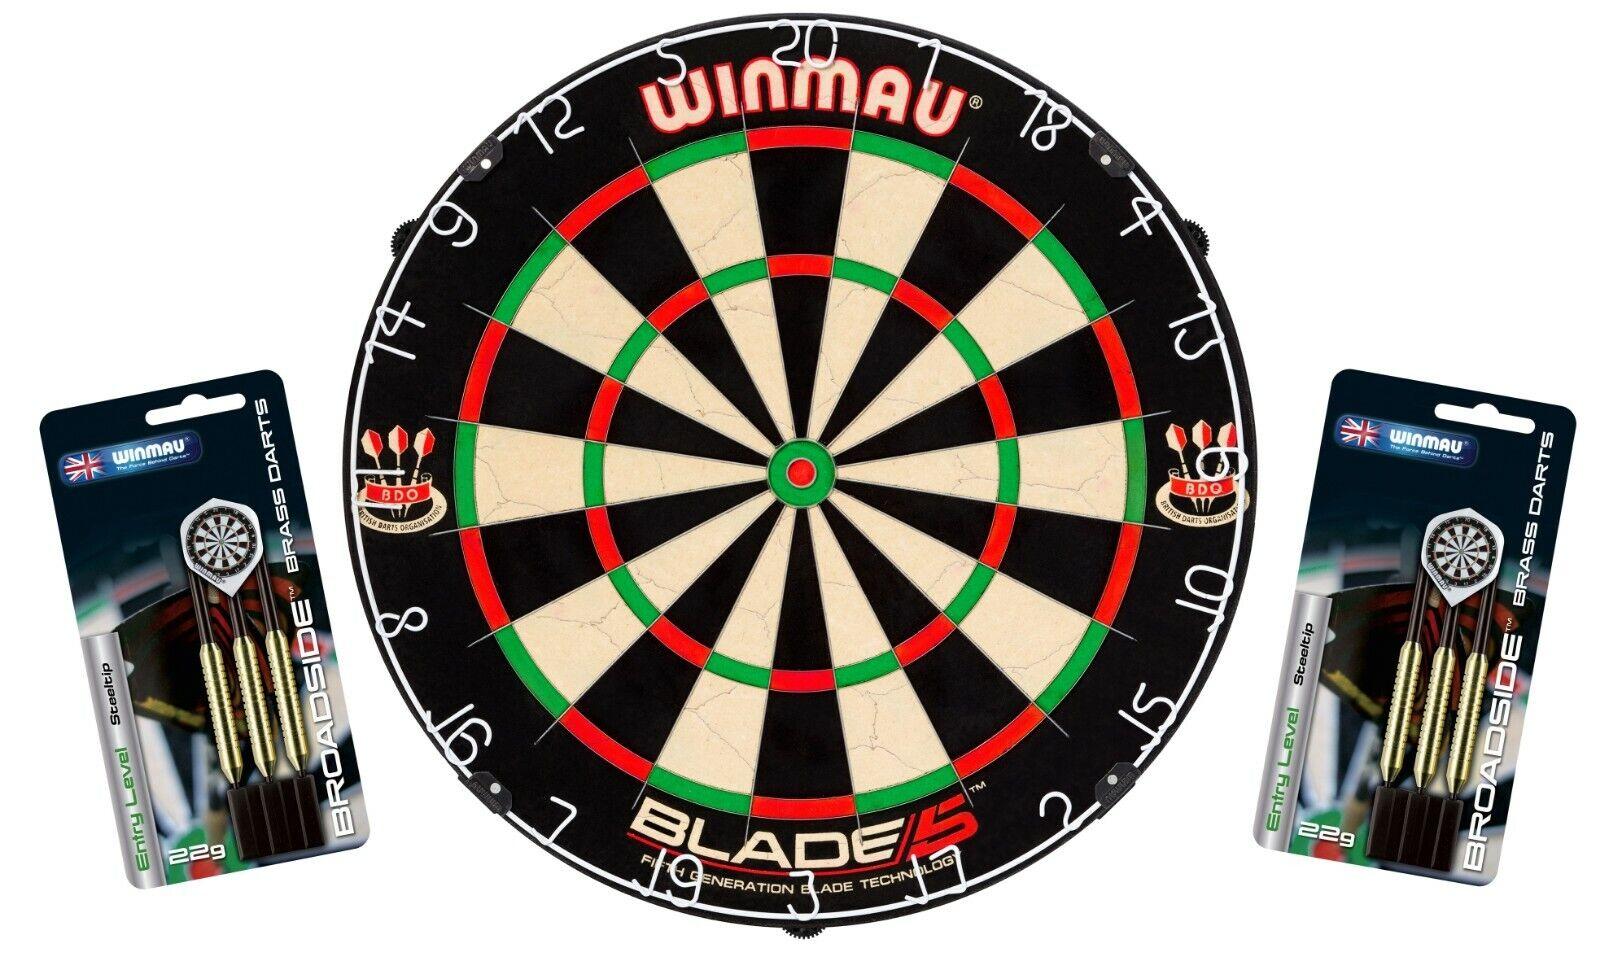 Dartboard WINMAU Original  Blade 5  + 2 2 2 Steeldart Sets  Broadside Brass  im Set df0895